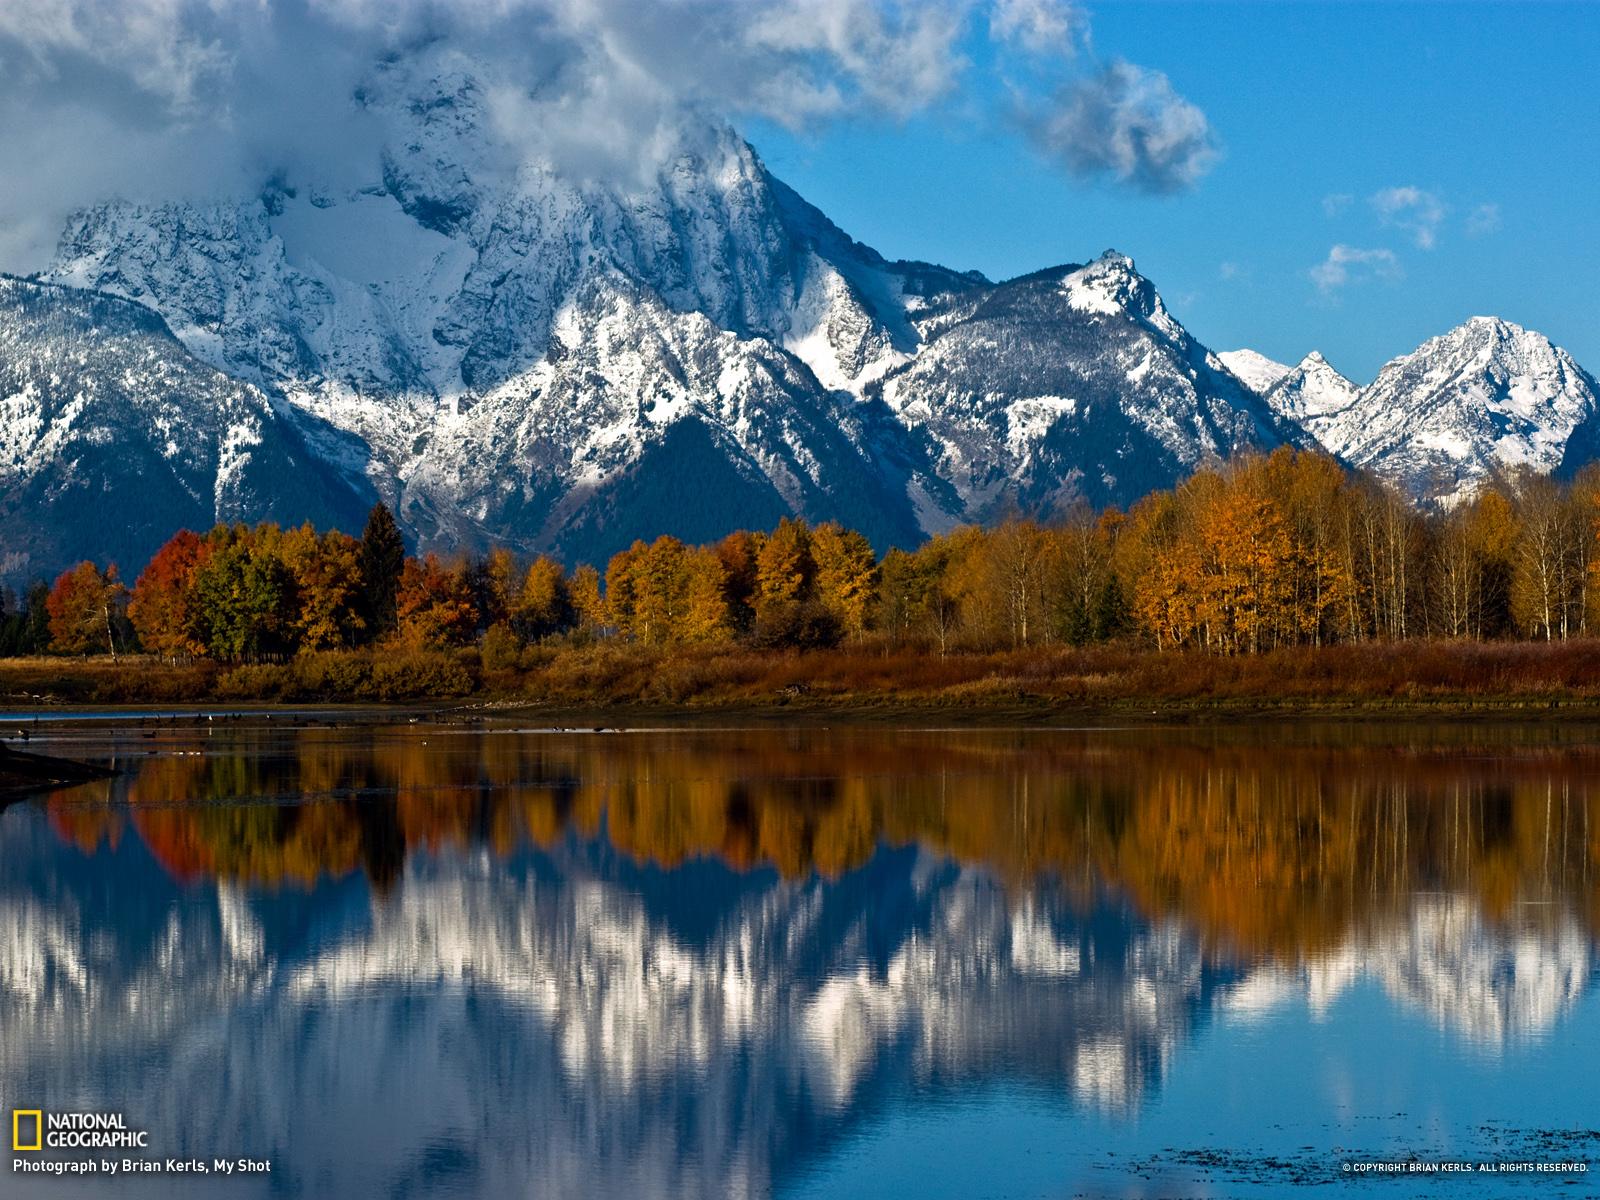 Eva Brosnan: Grand Teton National Park High Quality Wallpaper #644021.